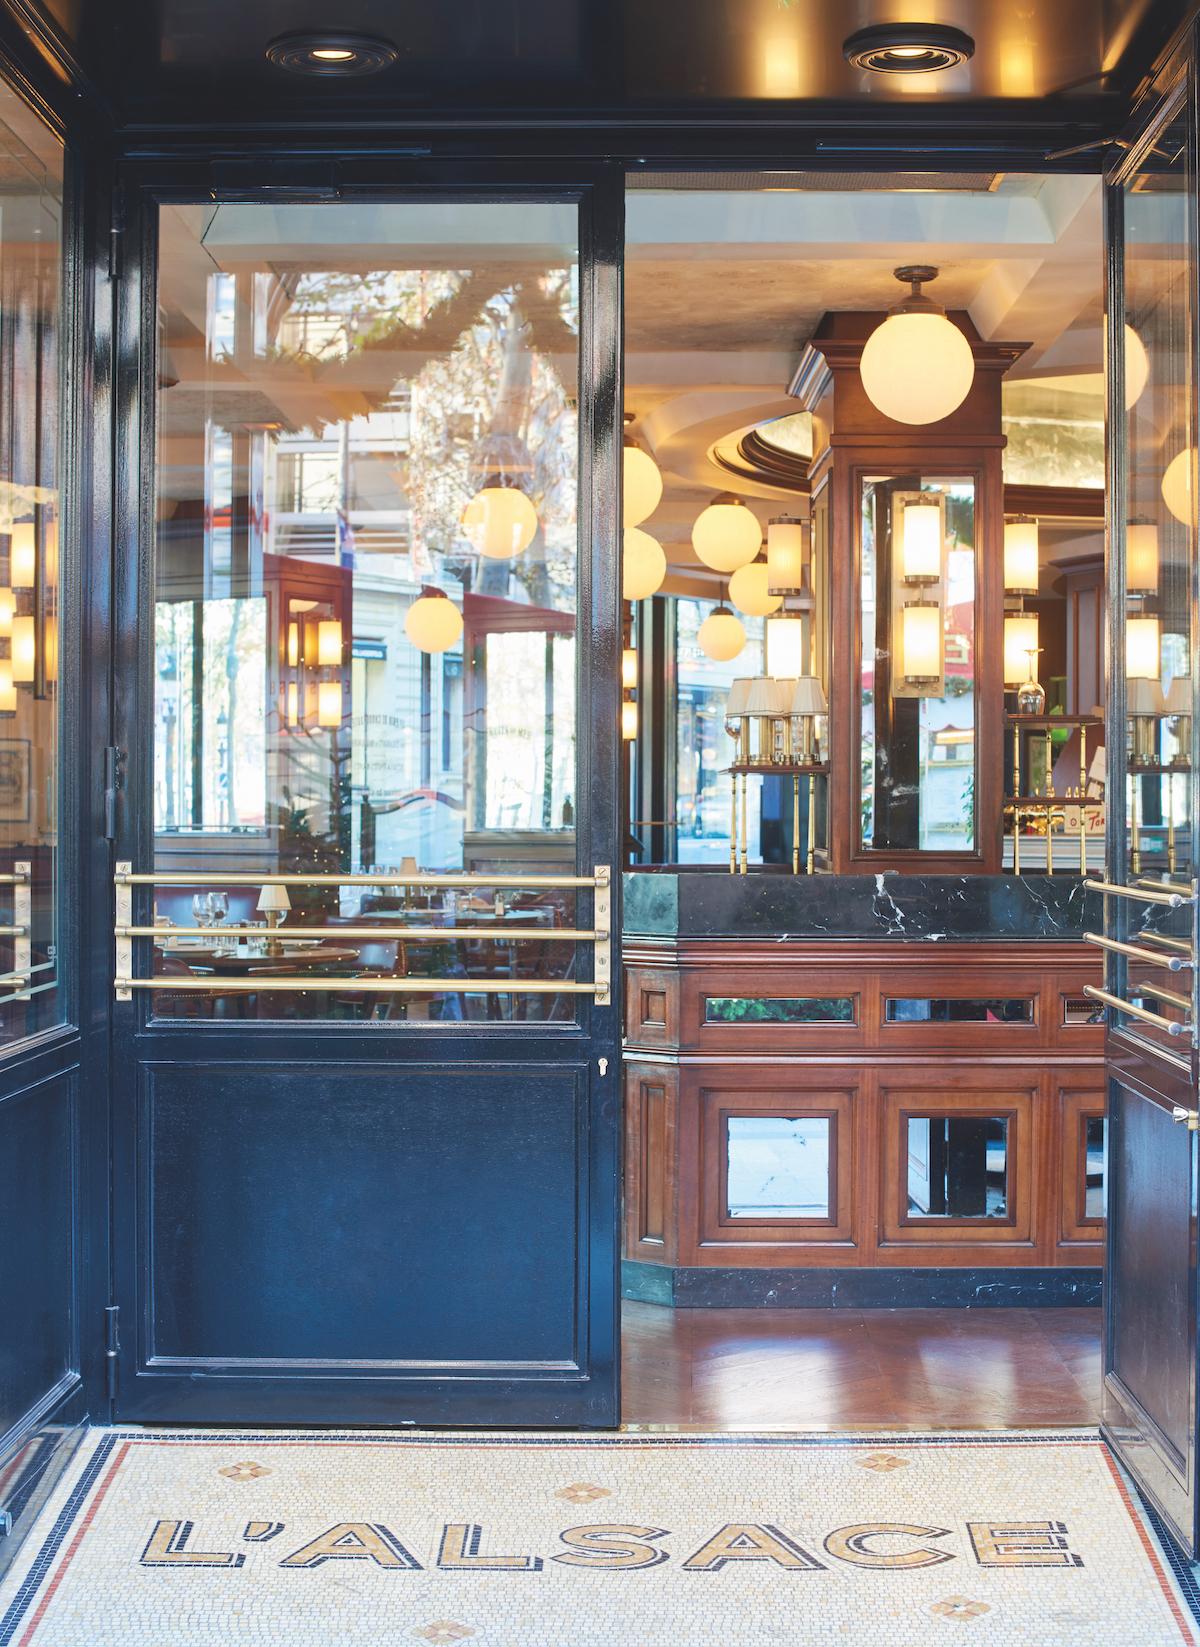 brasserie-l-ALSACE